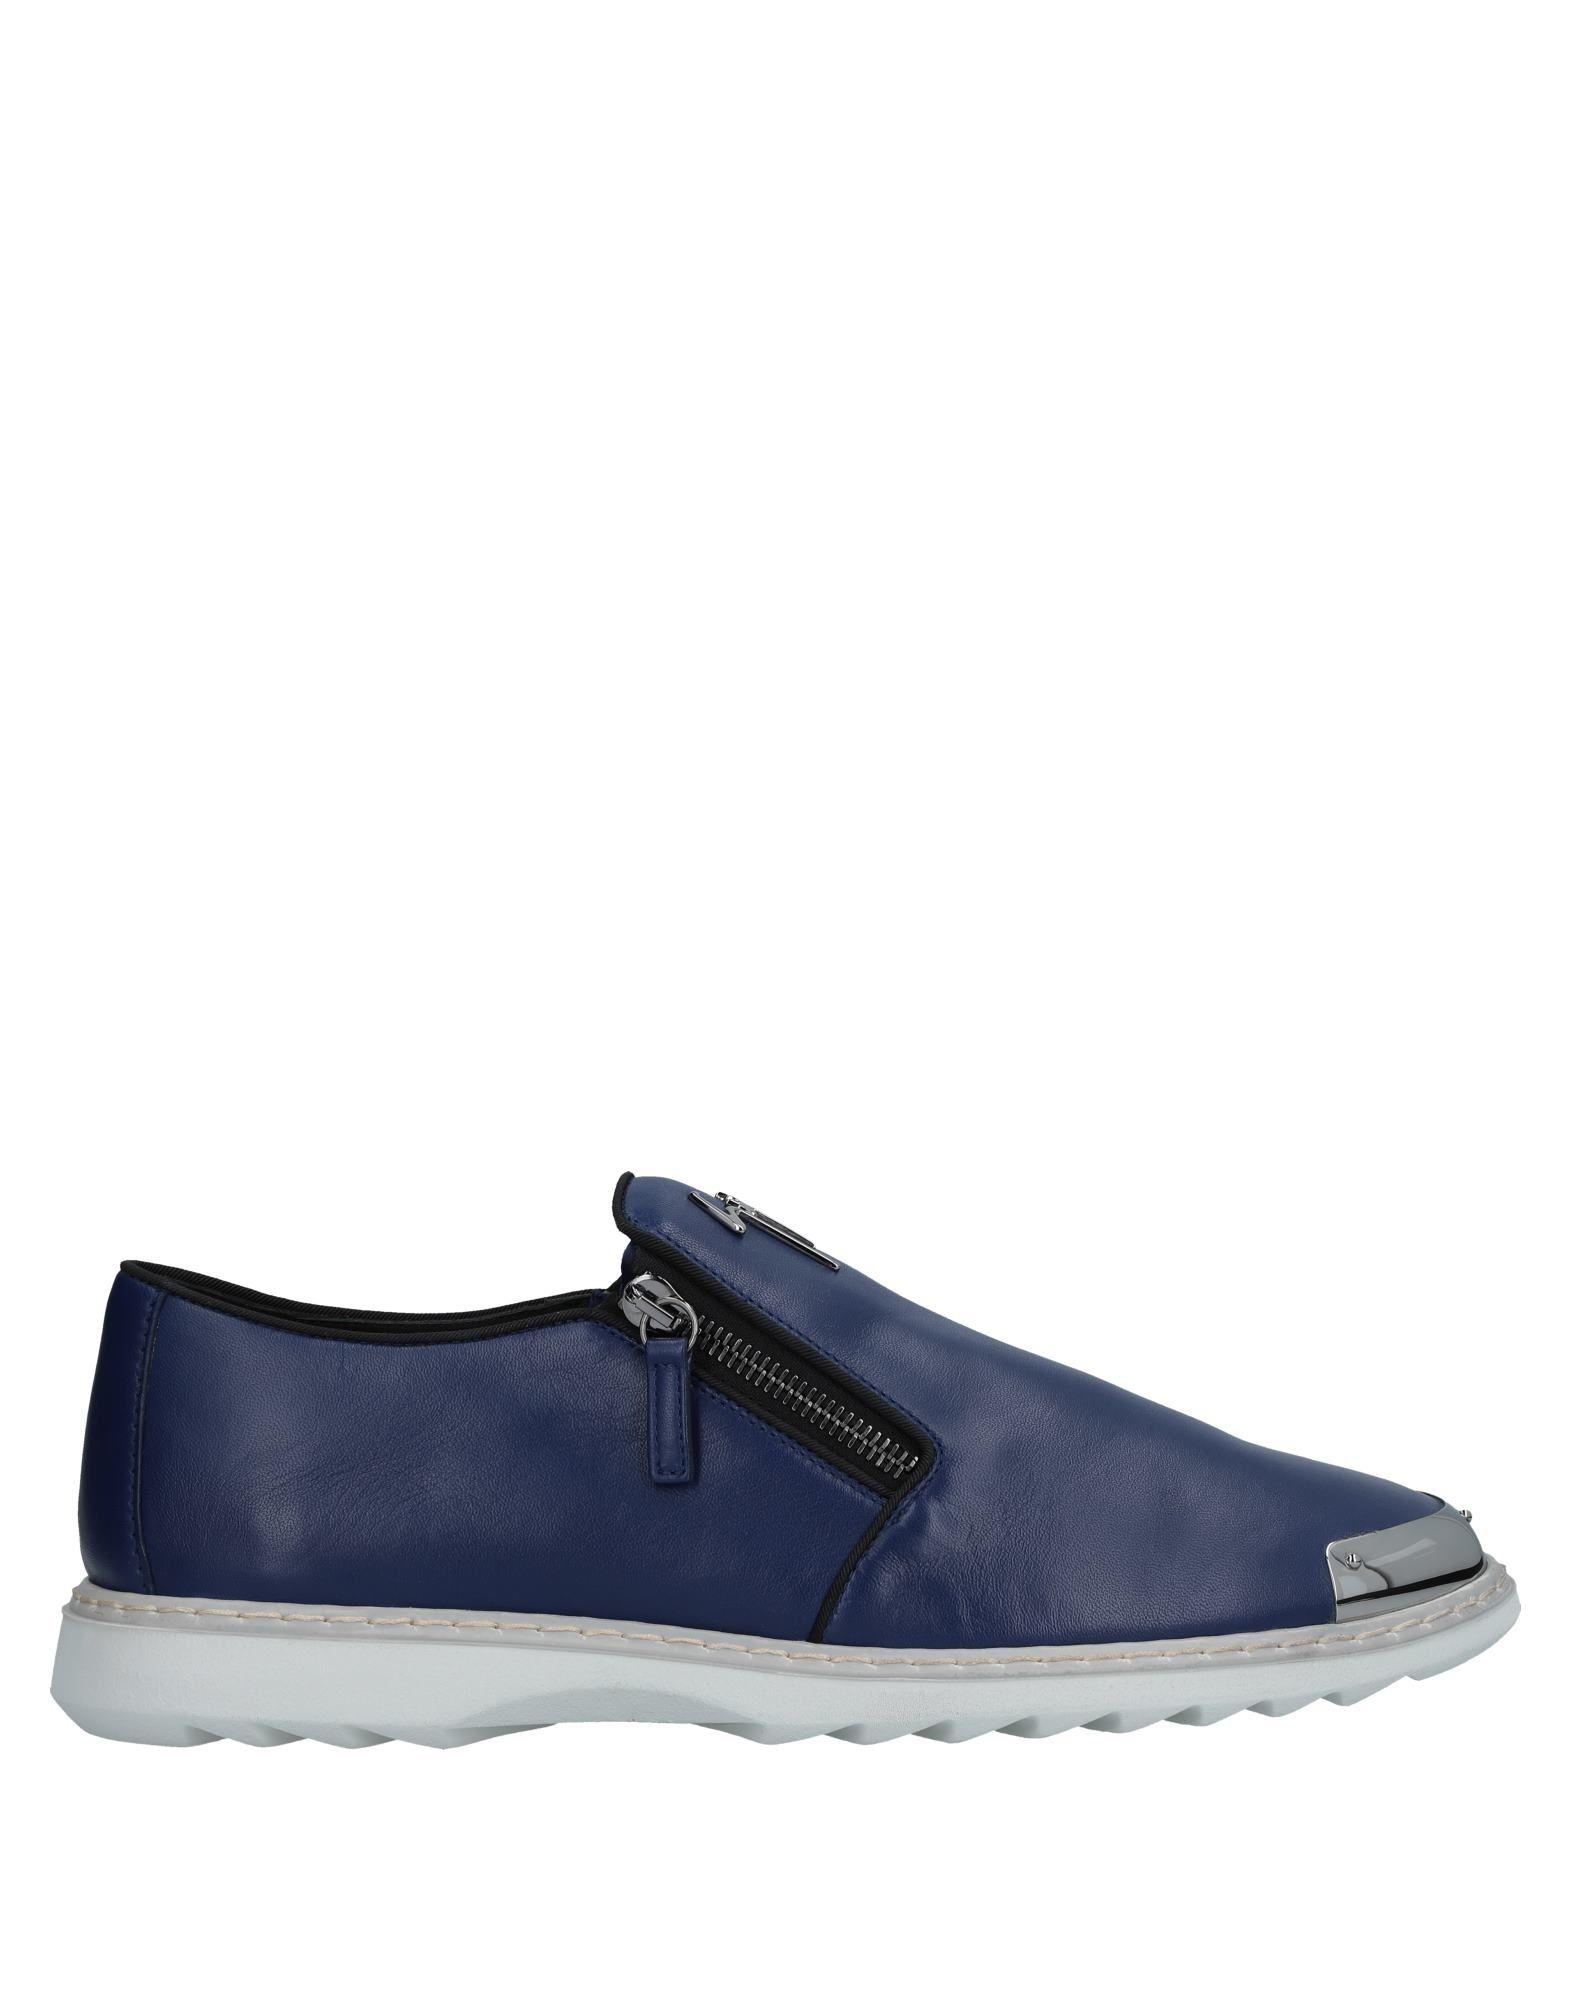 Giuseppe Zanotti Sneakers Herren  11517857SV Gute Qualität beliebte Schuhe